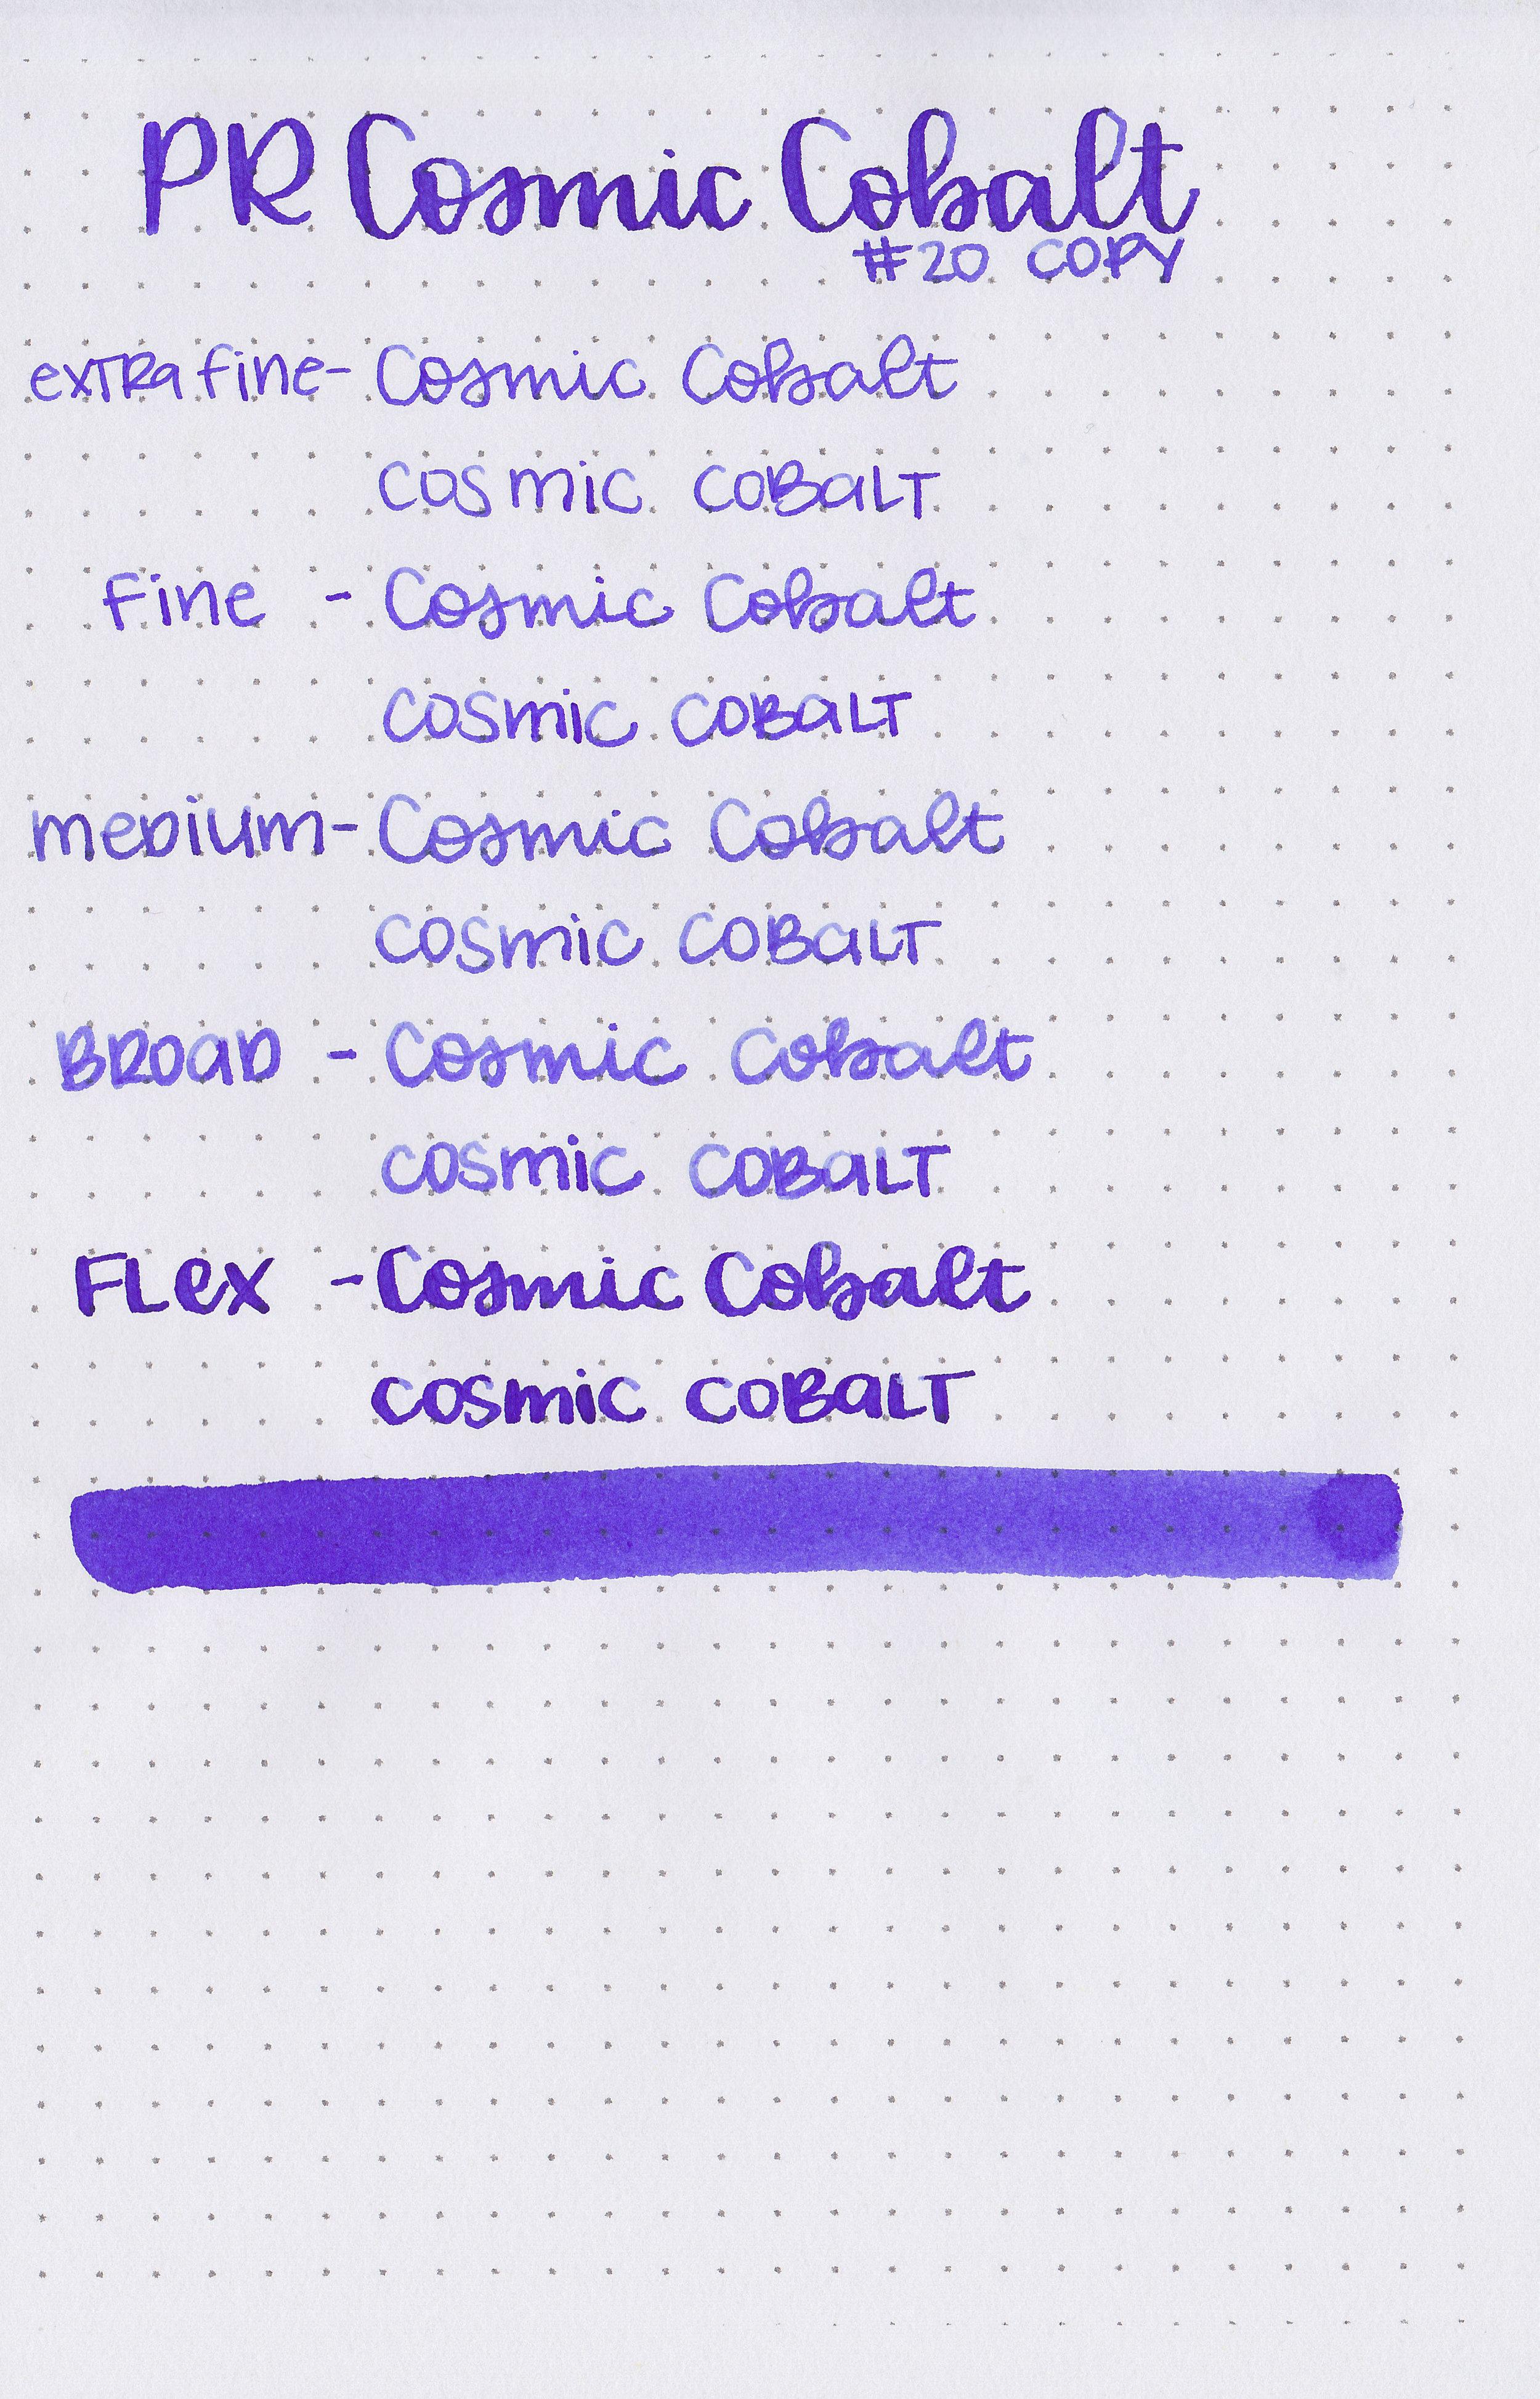 pr-cosmic-cobalt-12.jpg